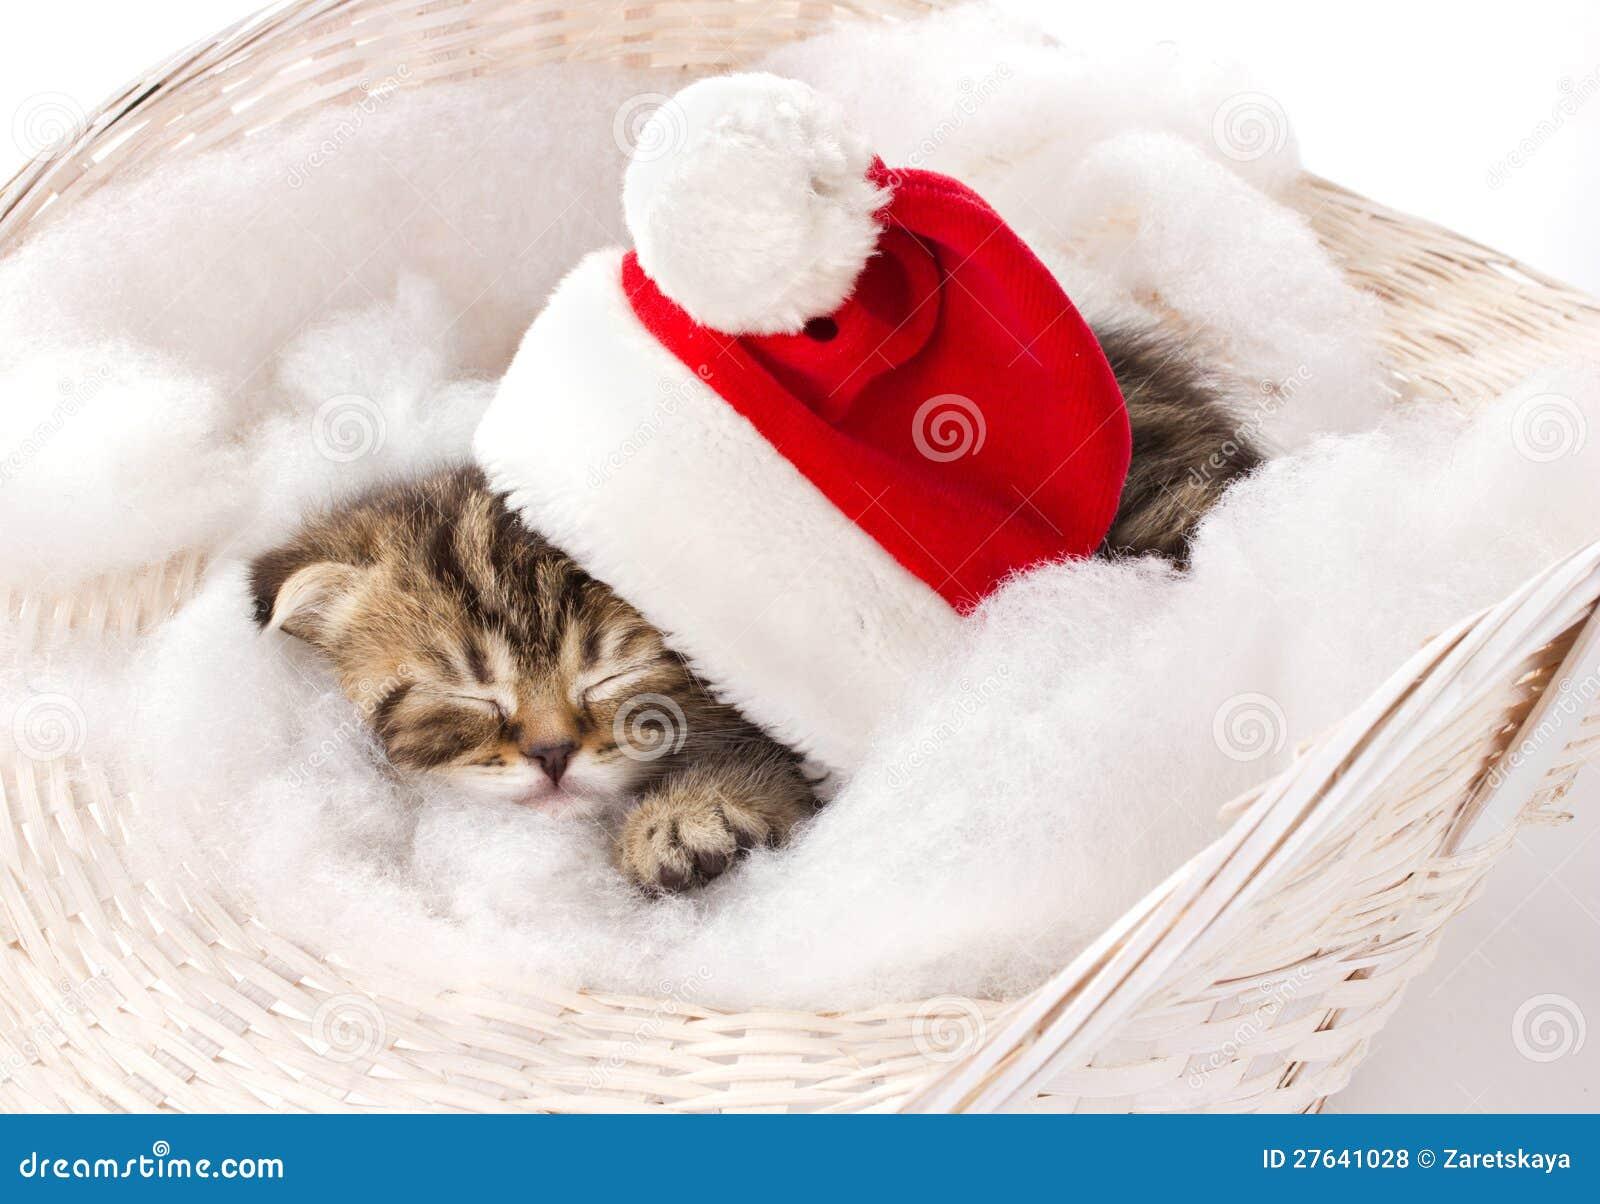 Furry Kitten Sleeping On Christmas Royalty Free Stock ...